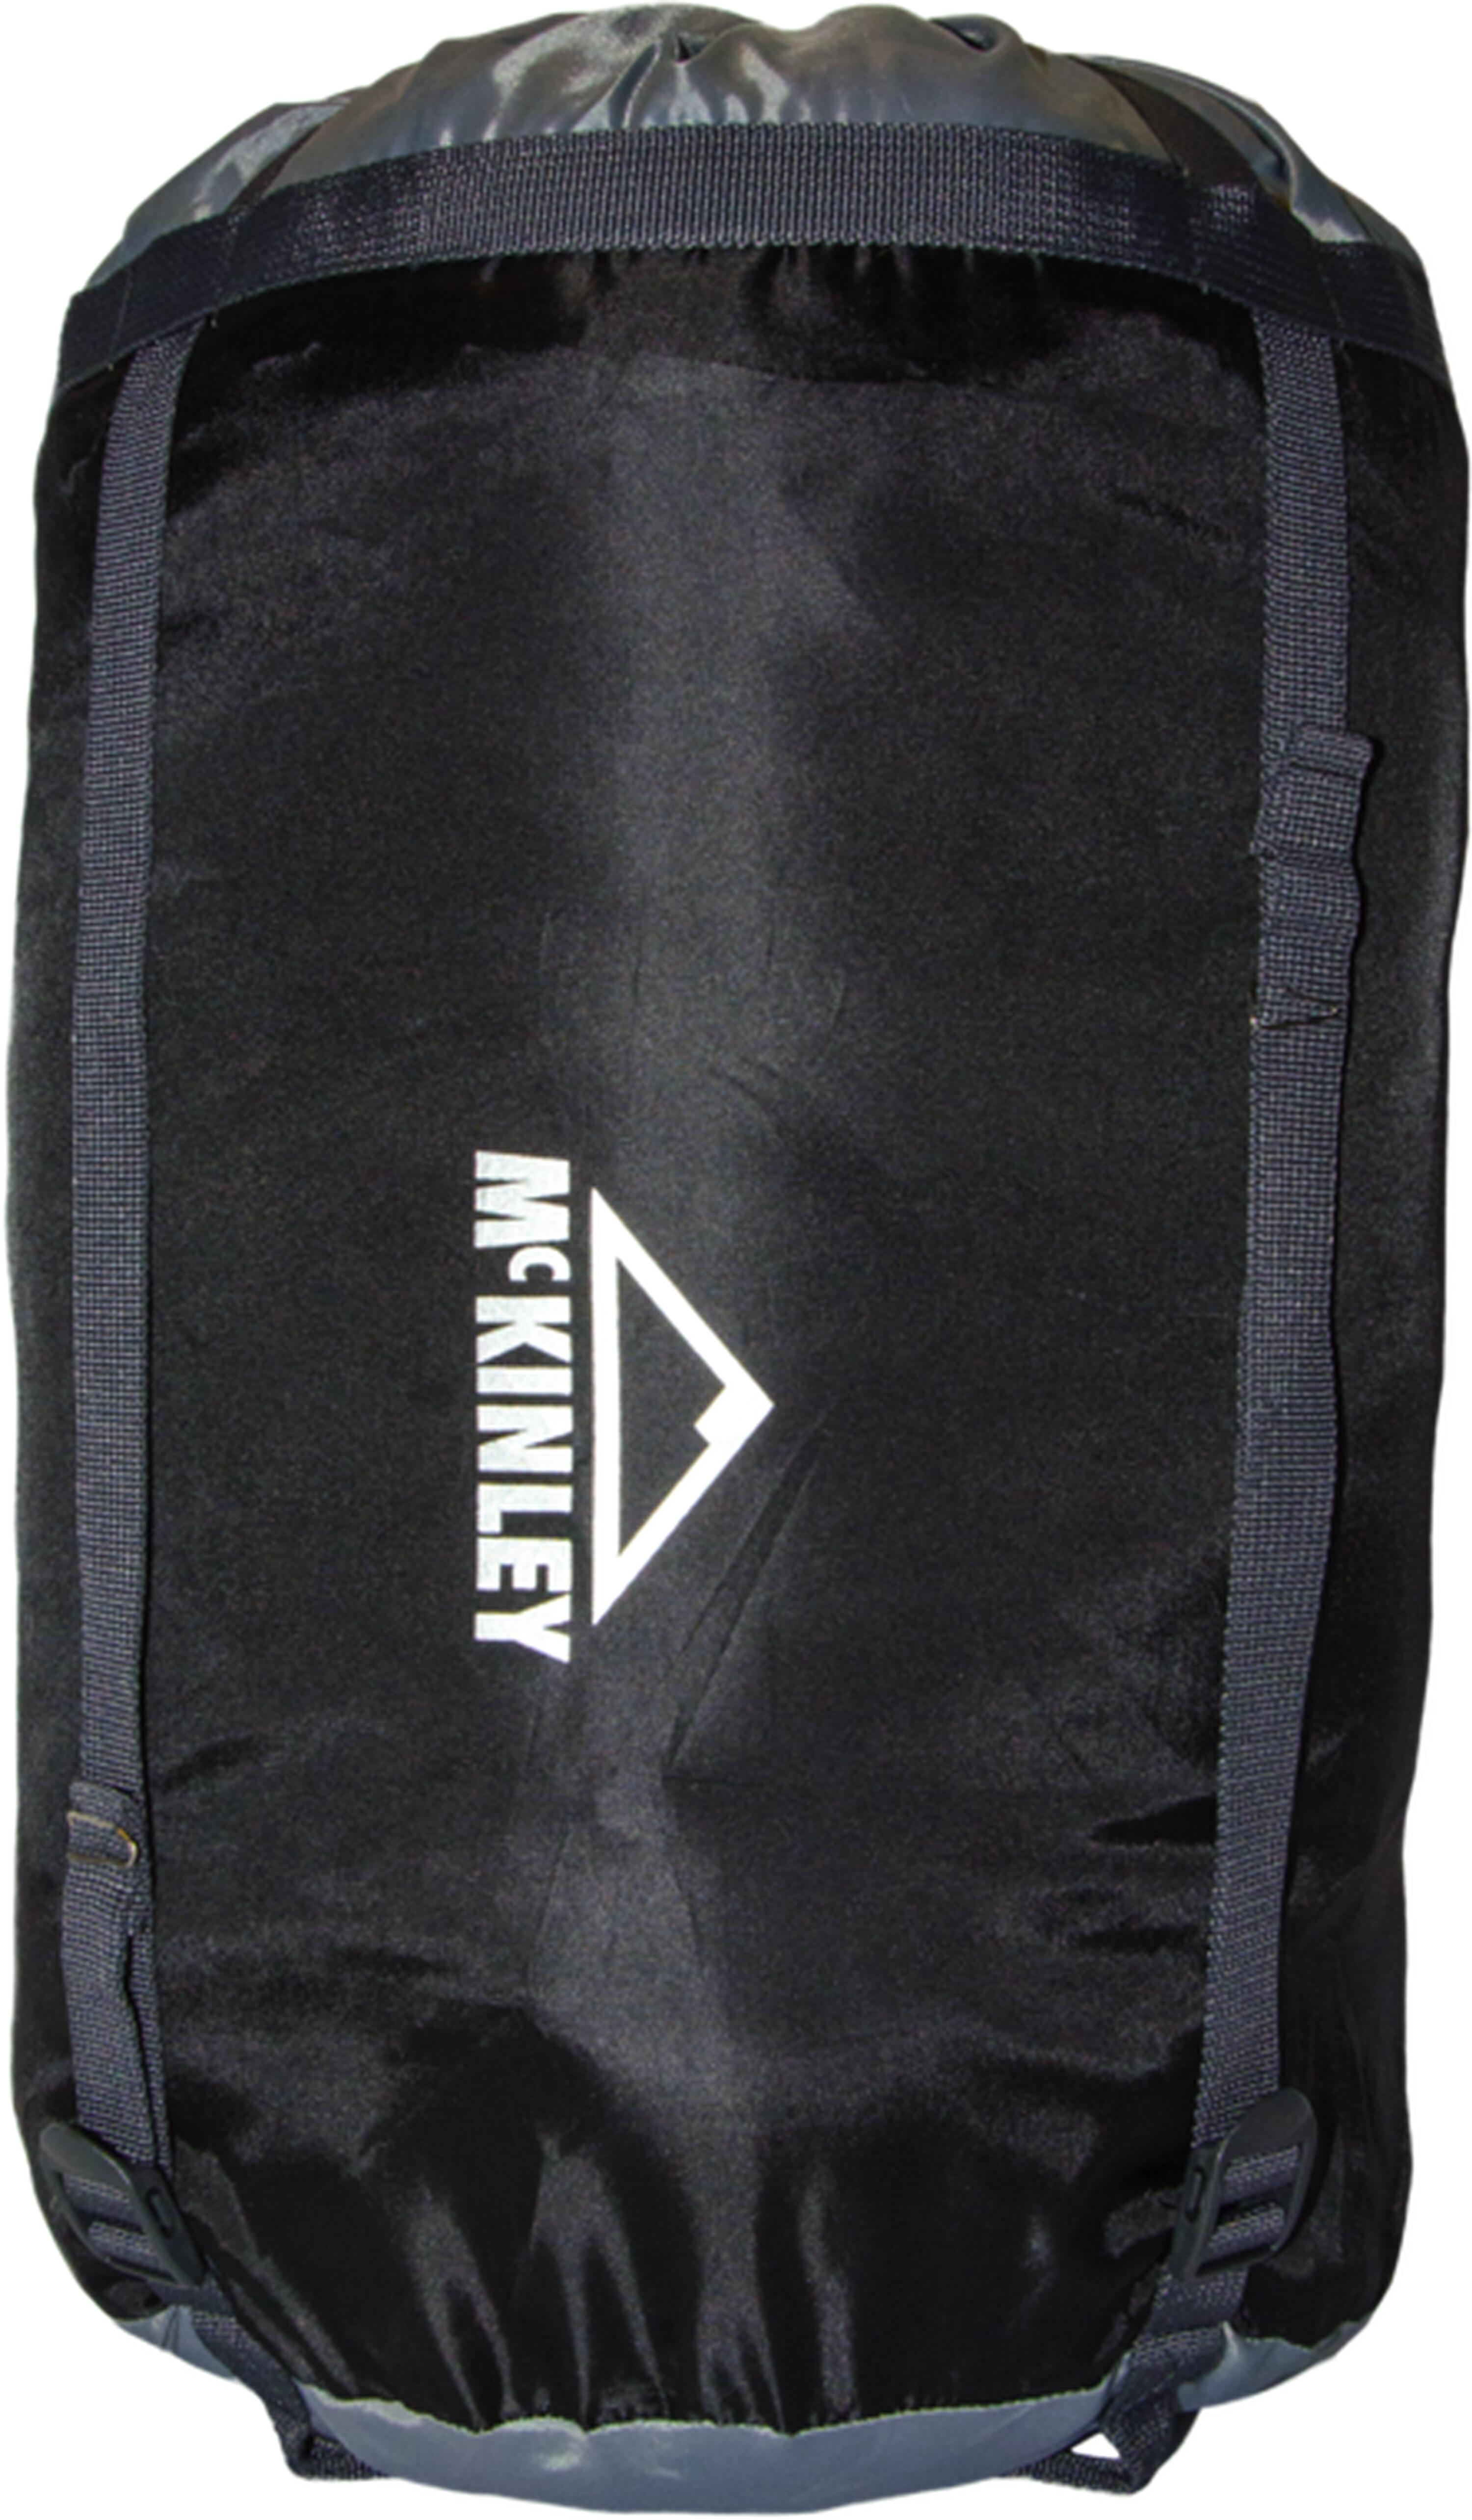 McKinley Kompressionspacksack Professional (Größe: 2 (45x22 cm), 900 charcoal/hellgrau)